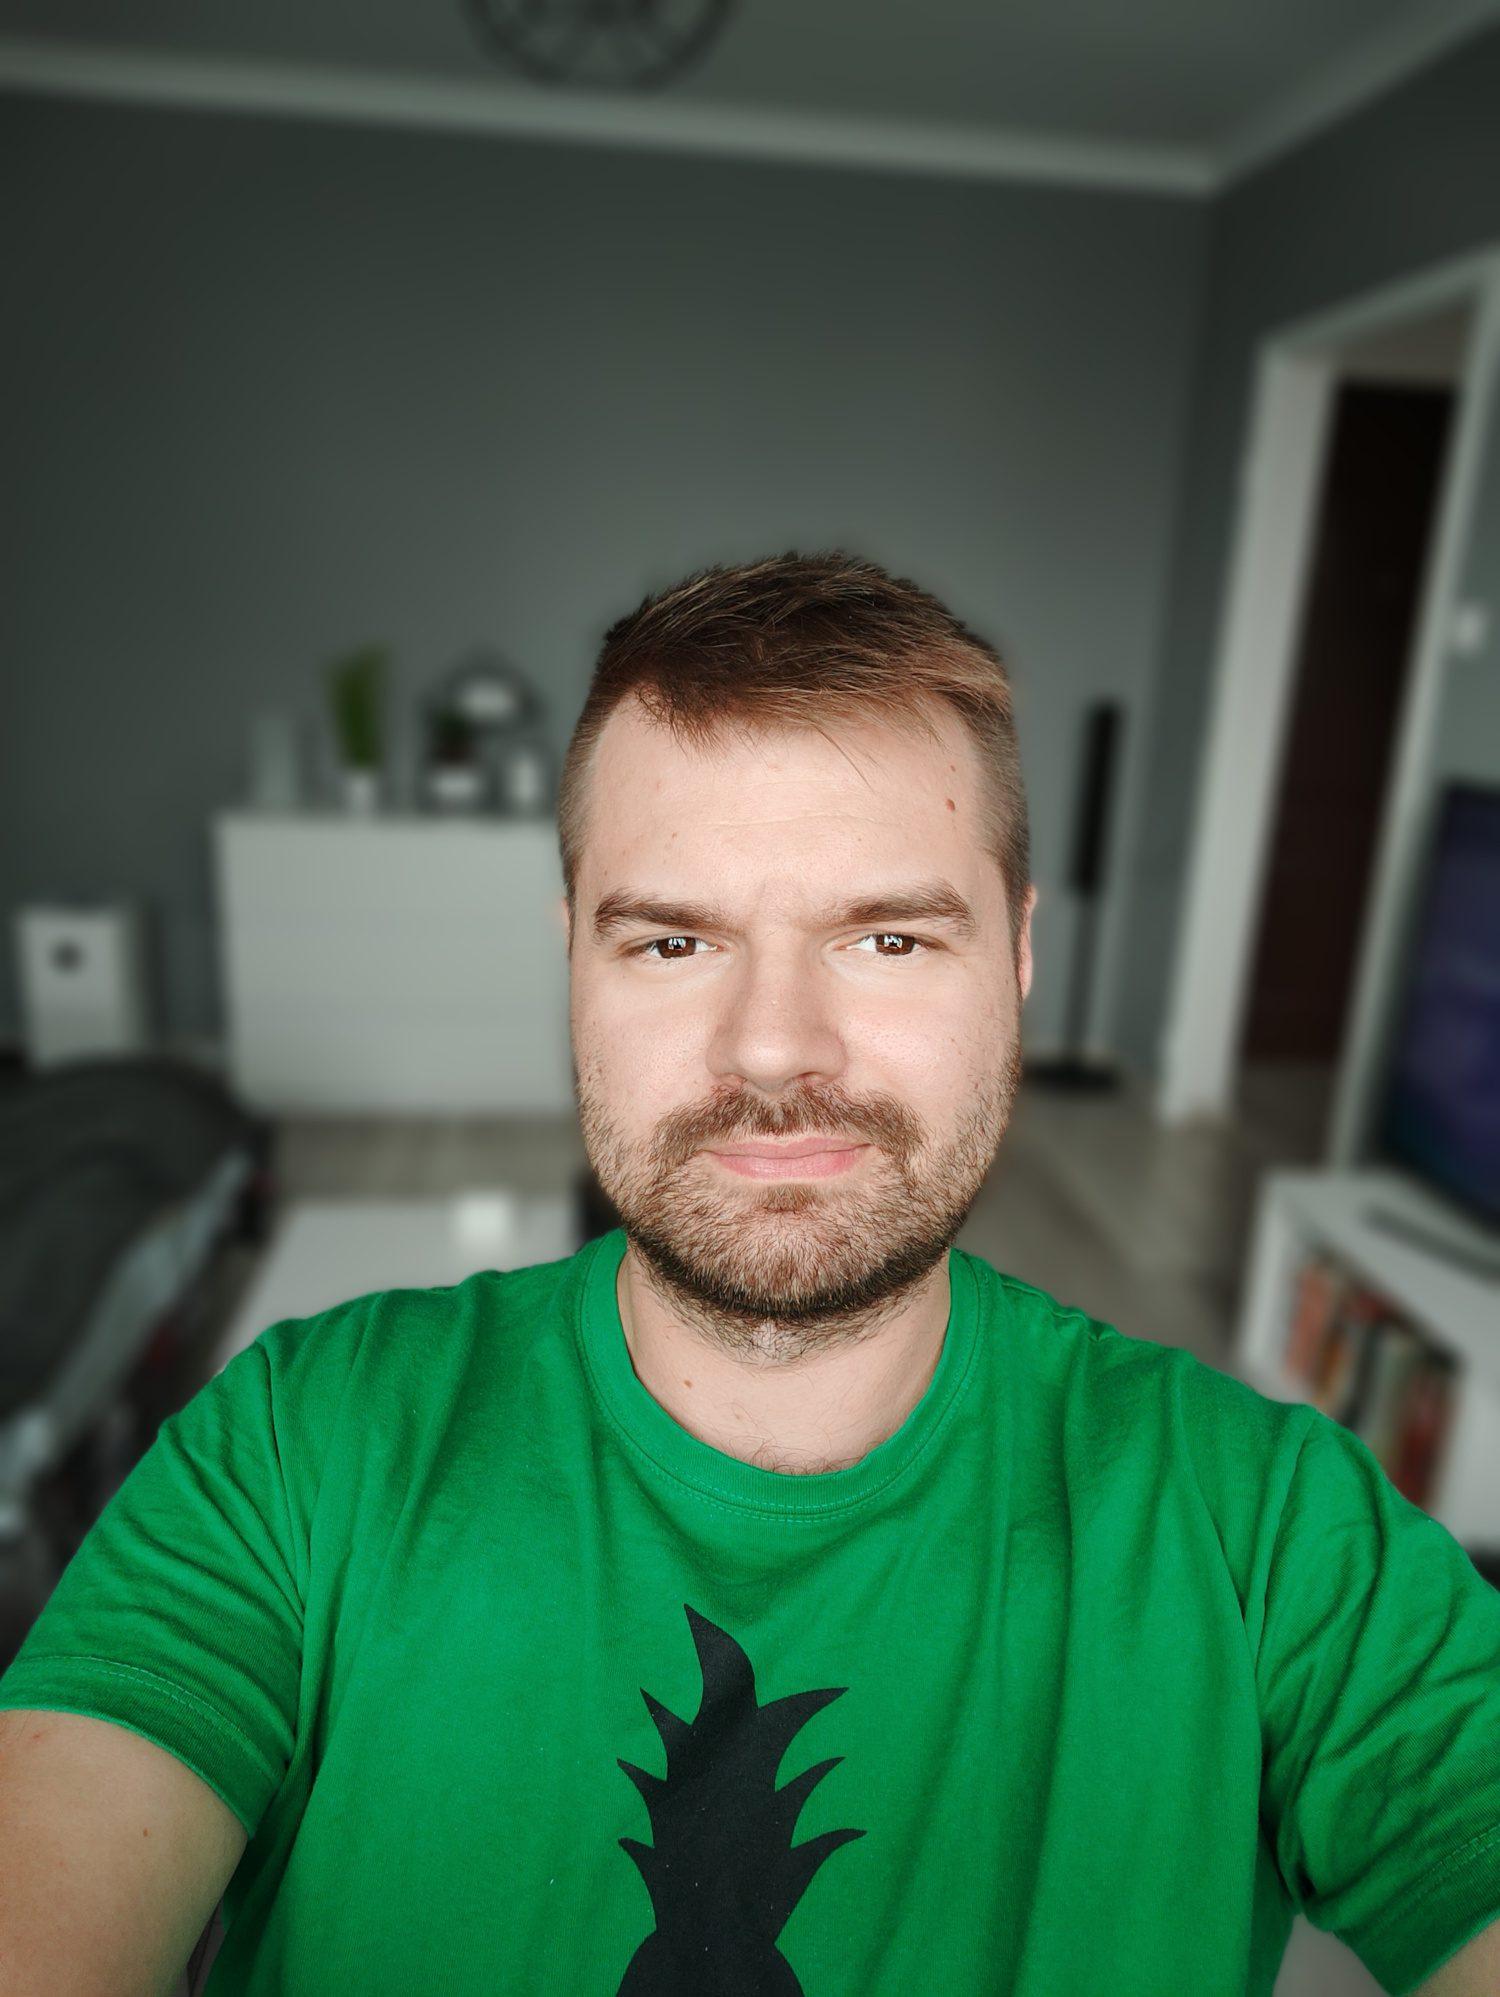 realme gt me selfie portret